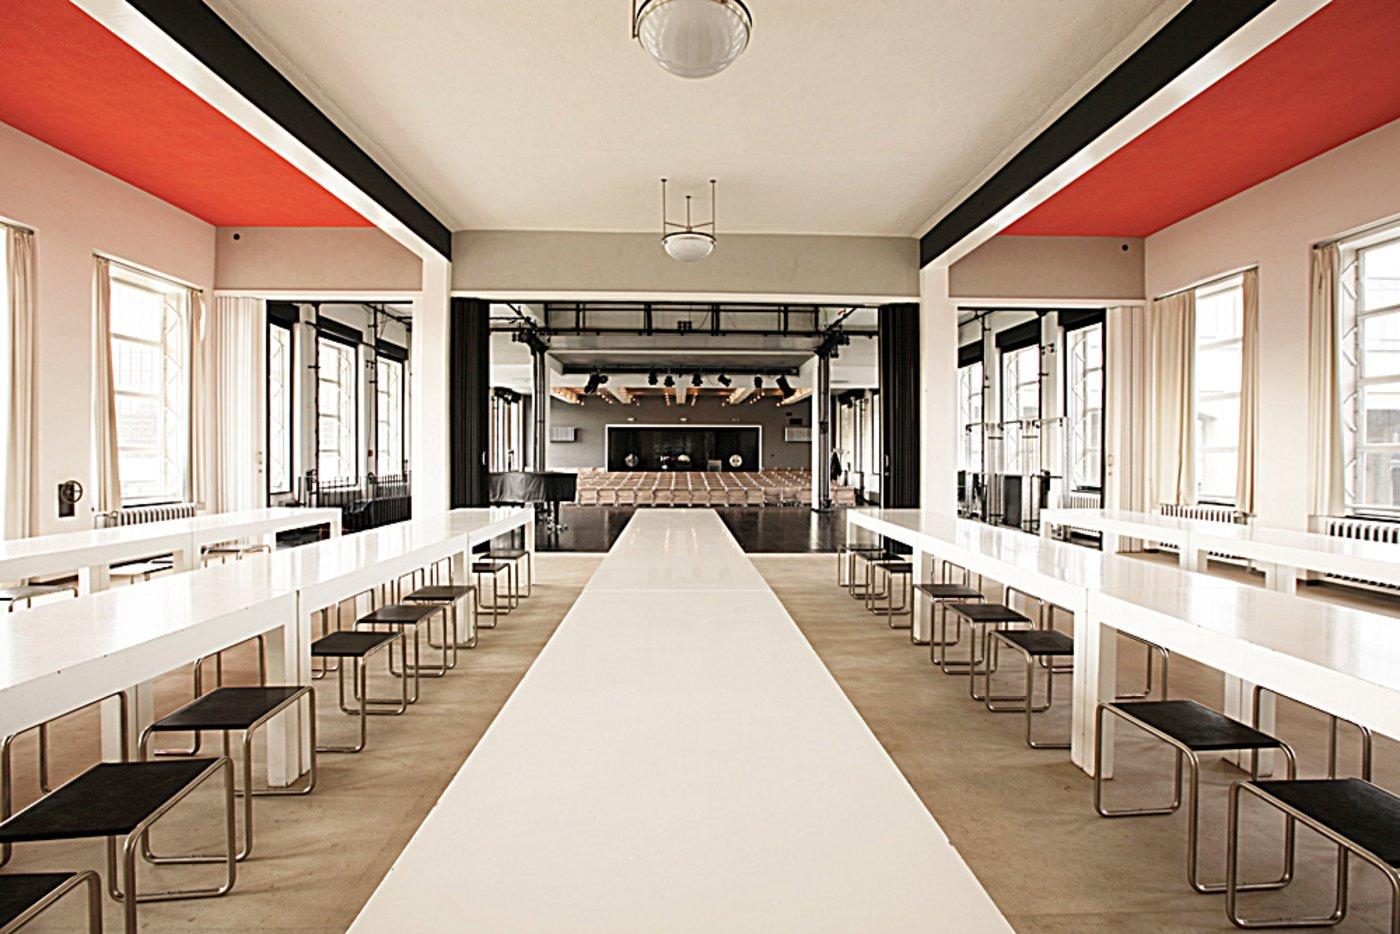 gastronomie stiftung bauhaus dessau bauhaus dessau foundation. Black Bedroom Furniture Sets. Home Design Ideas